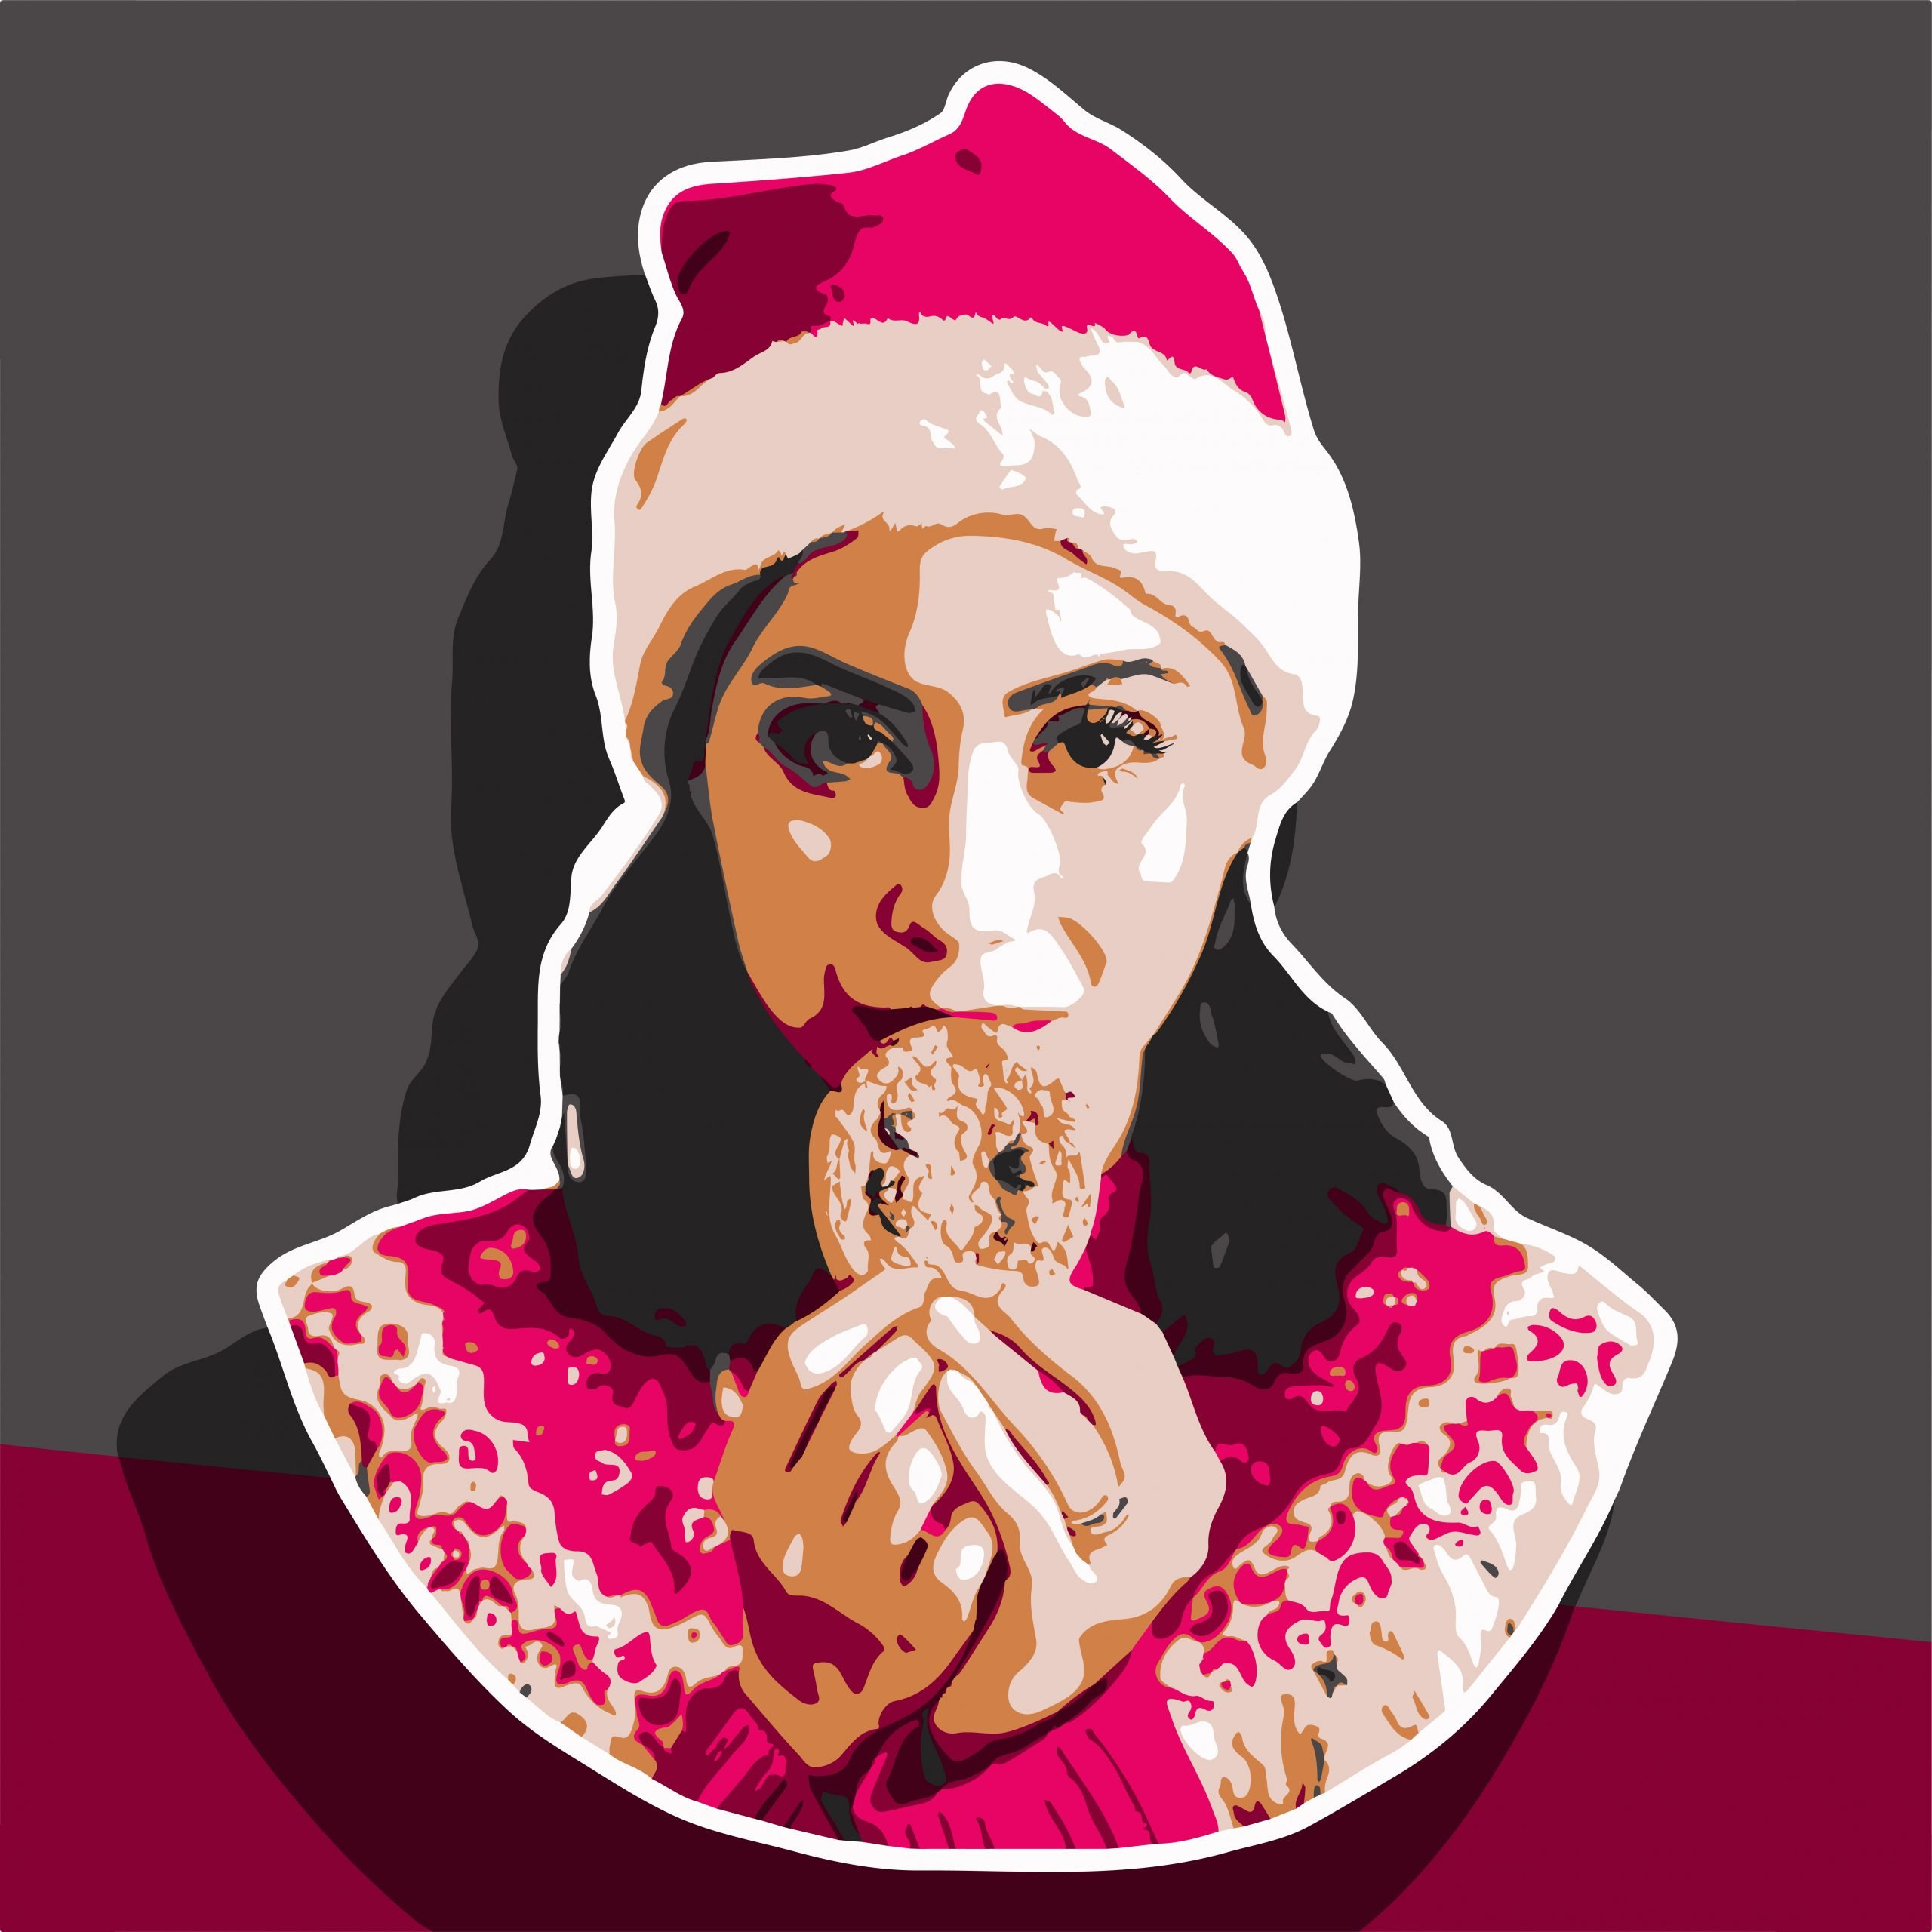 Creative girl portrait illustration